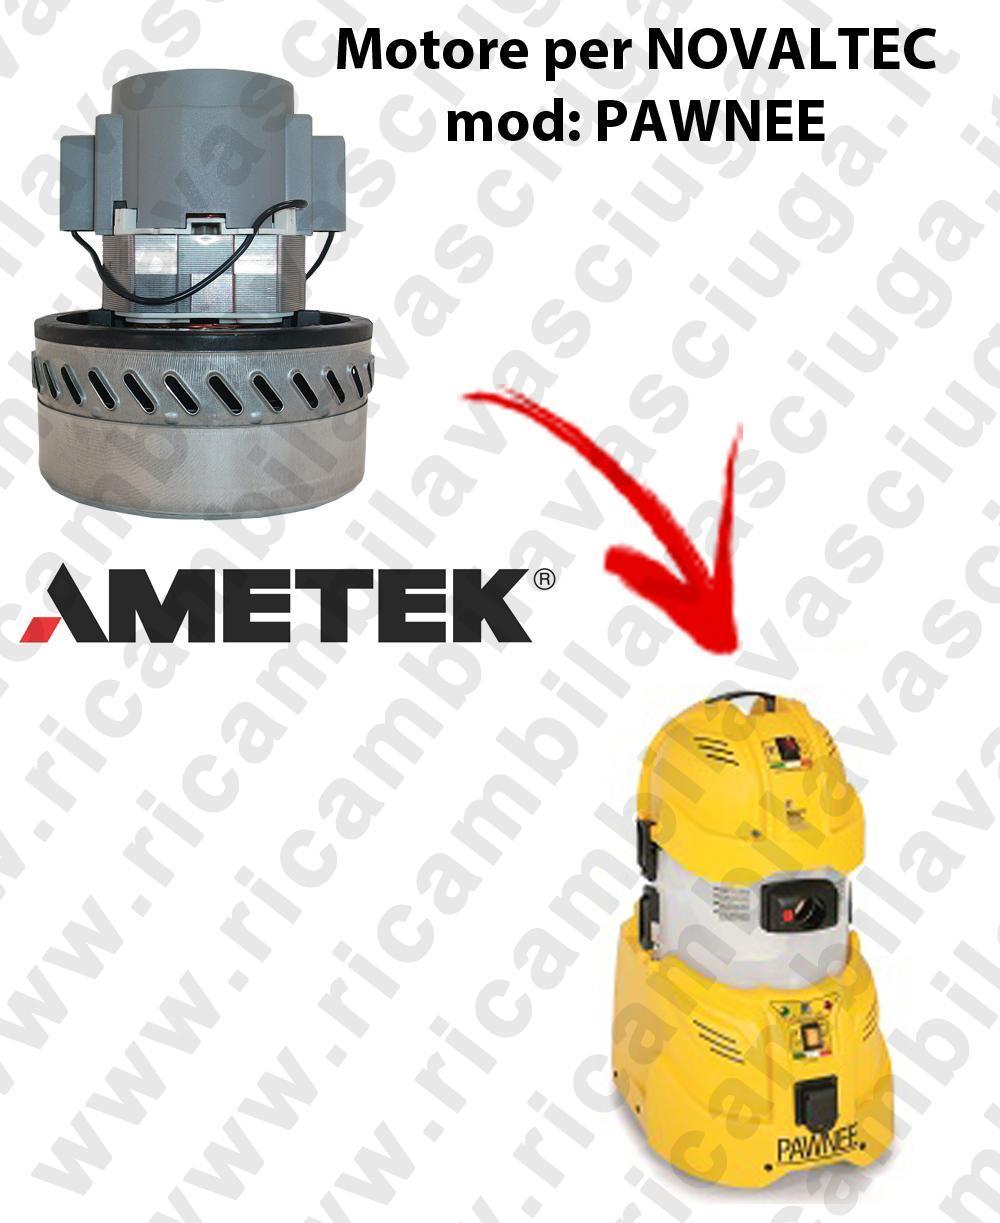 PAWNEE Saugmotor AMETEK für Staubsauger NOVALTEC